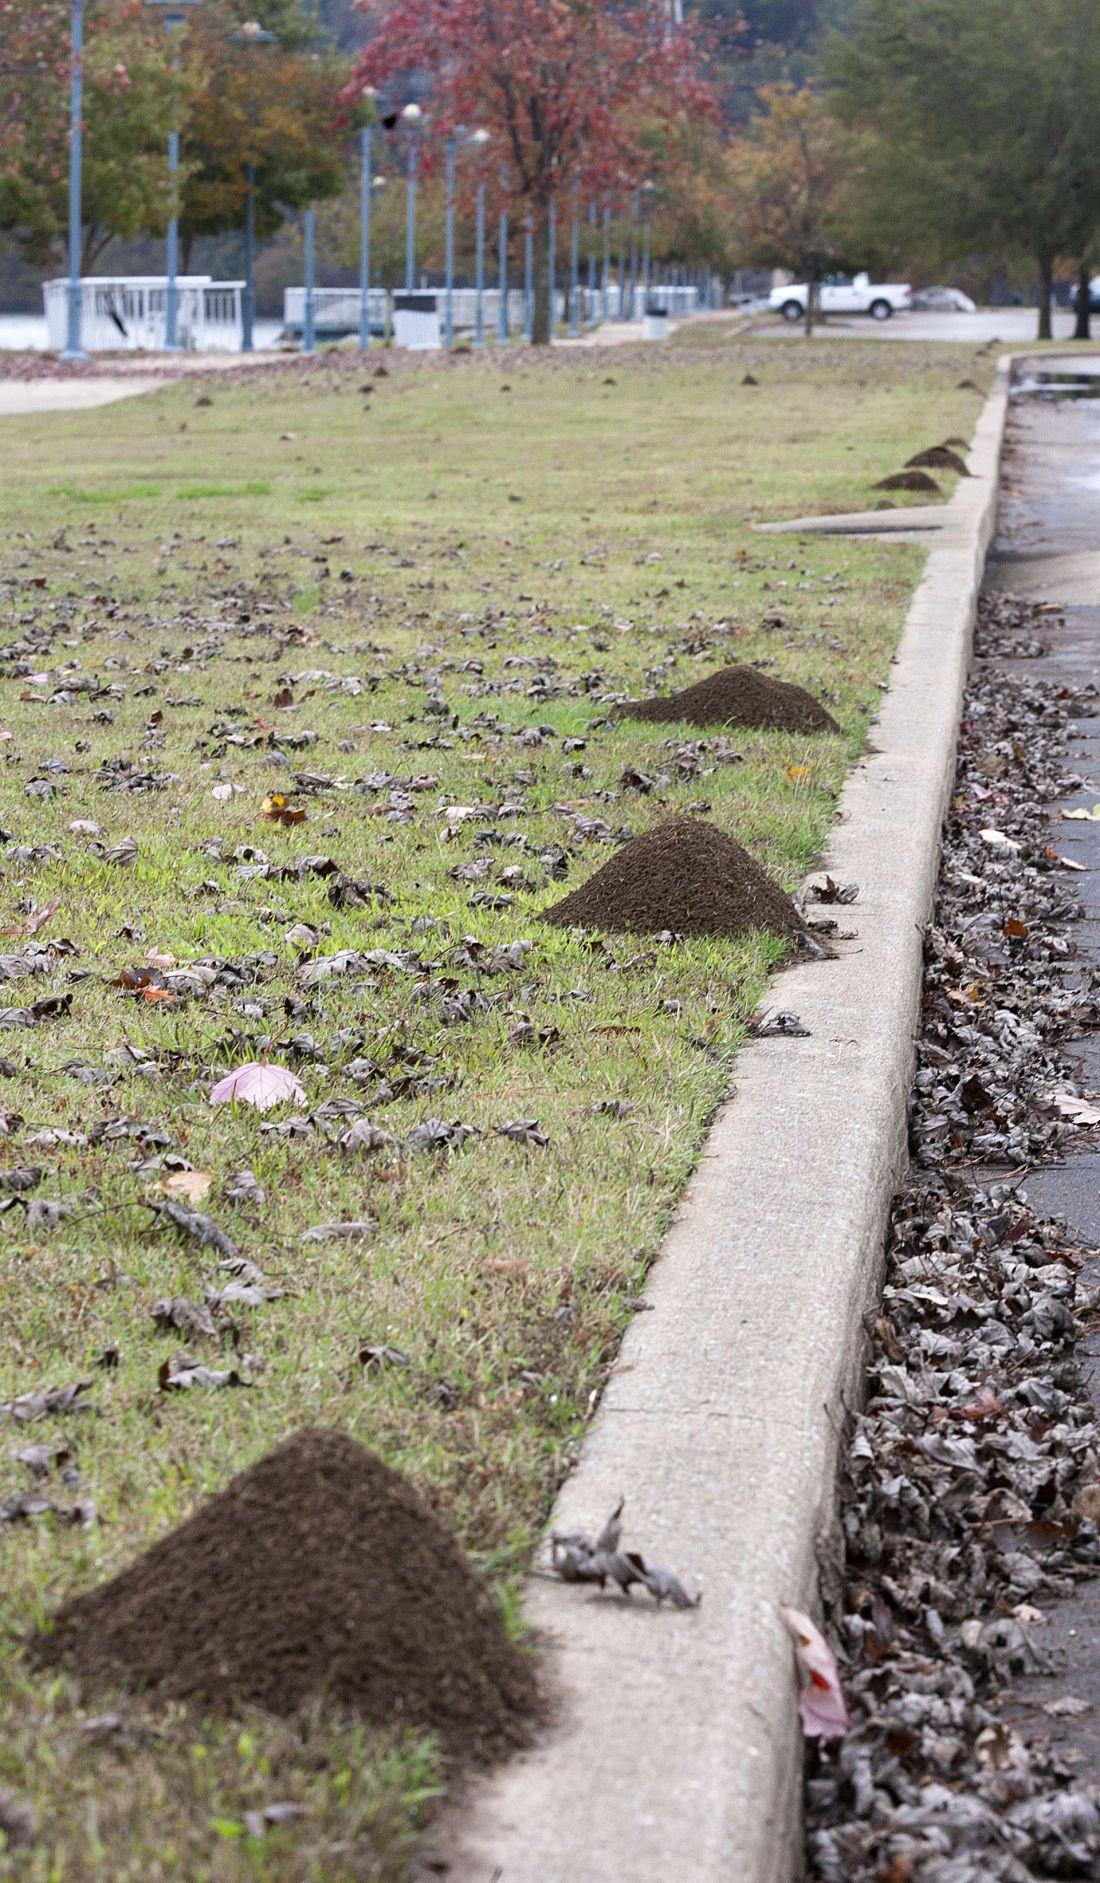 McFarland Park Ants 2